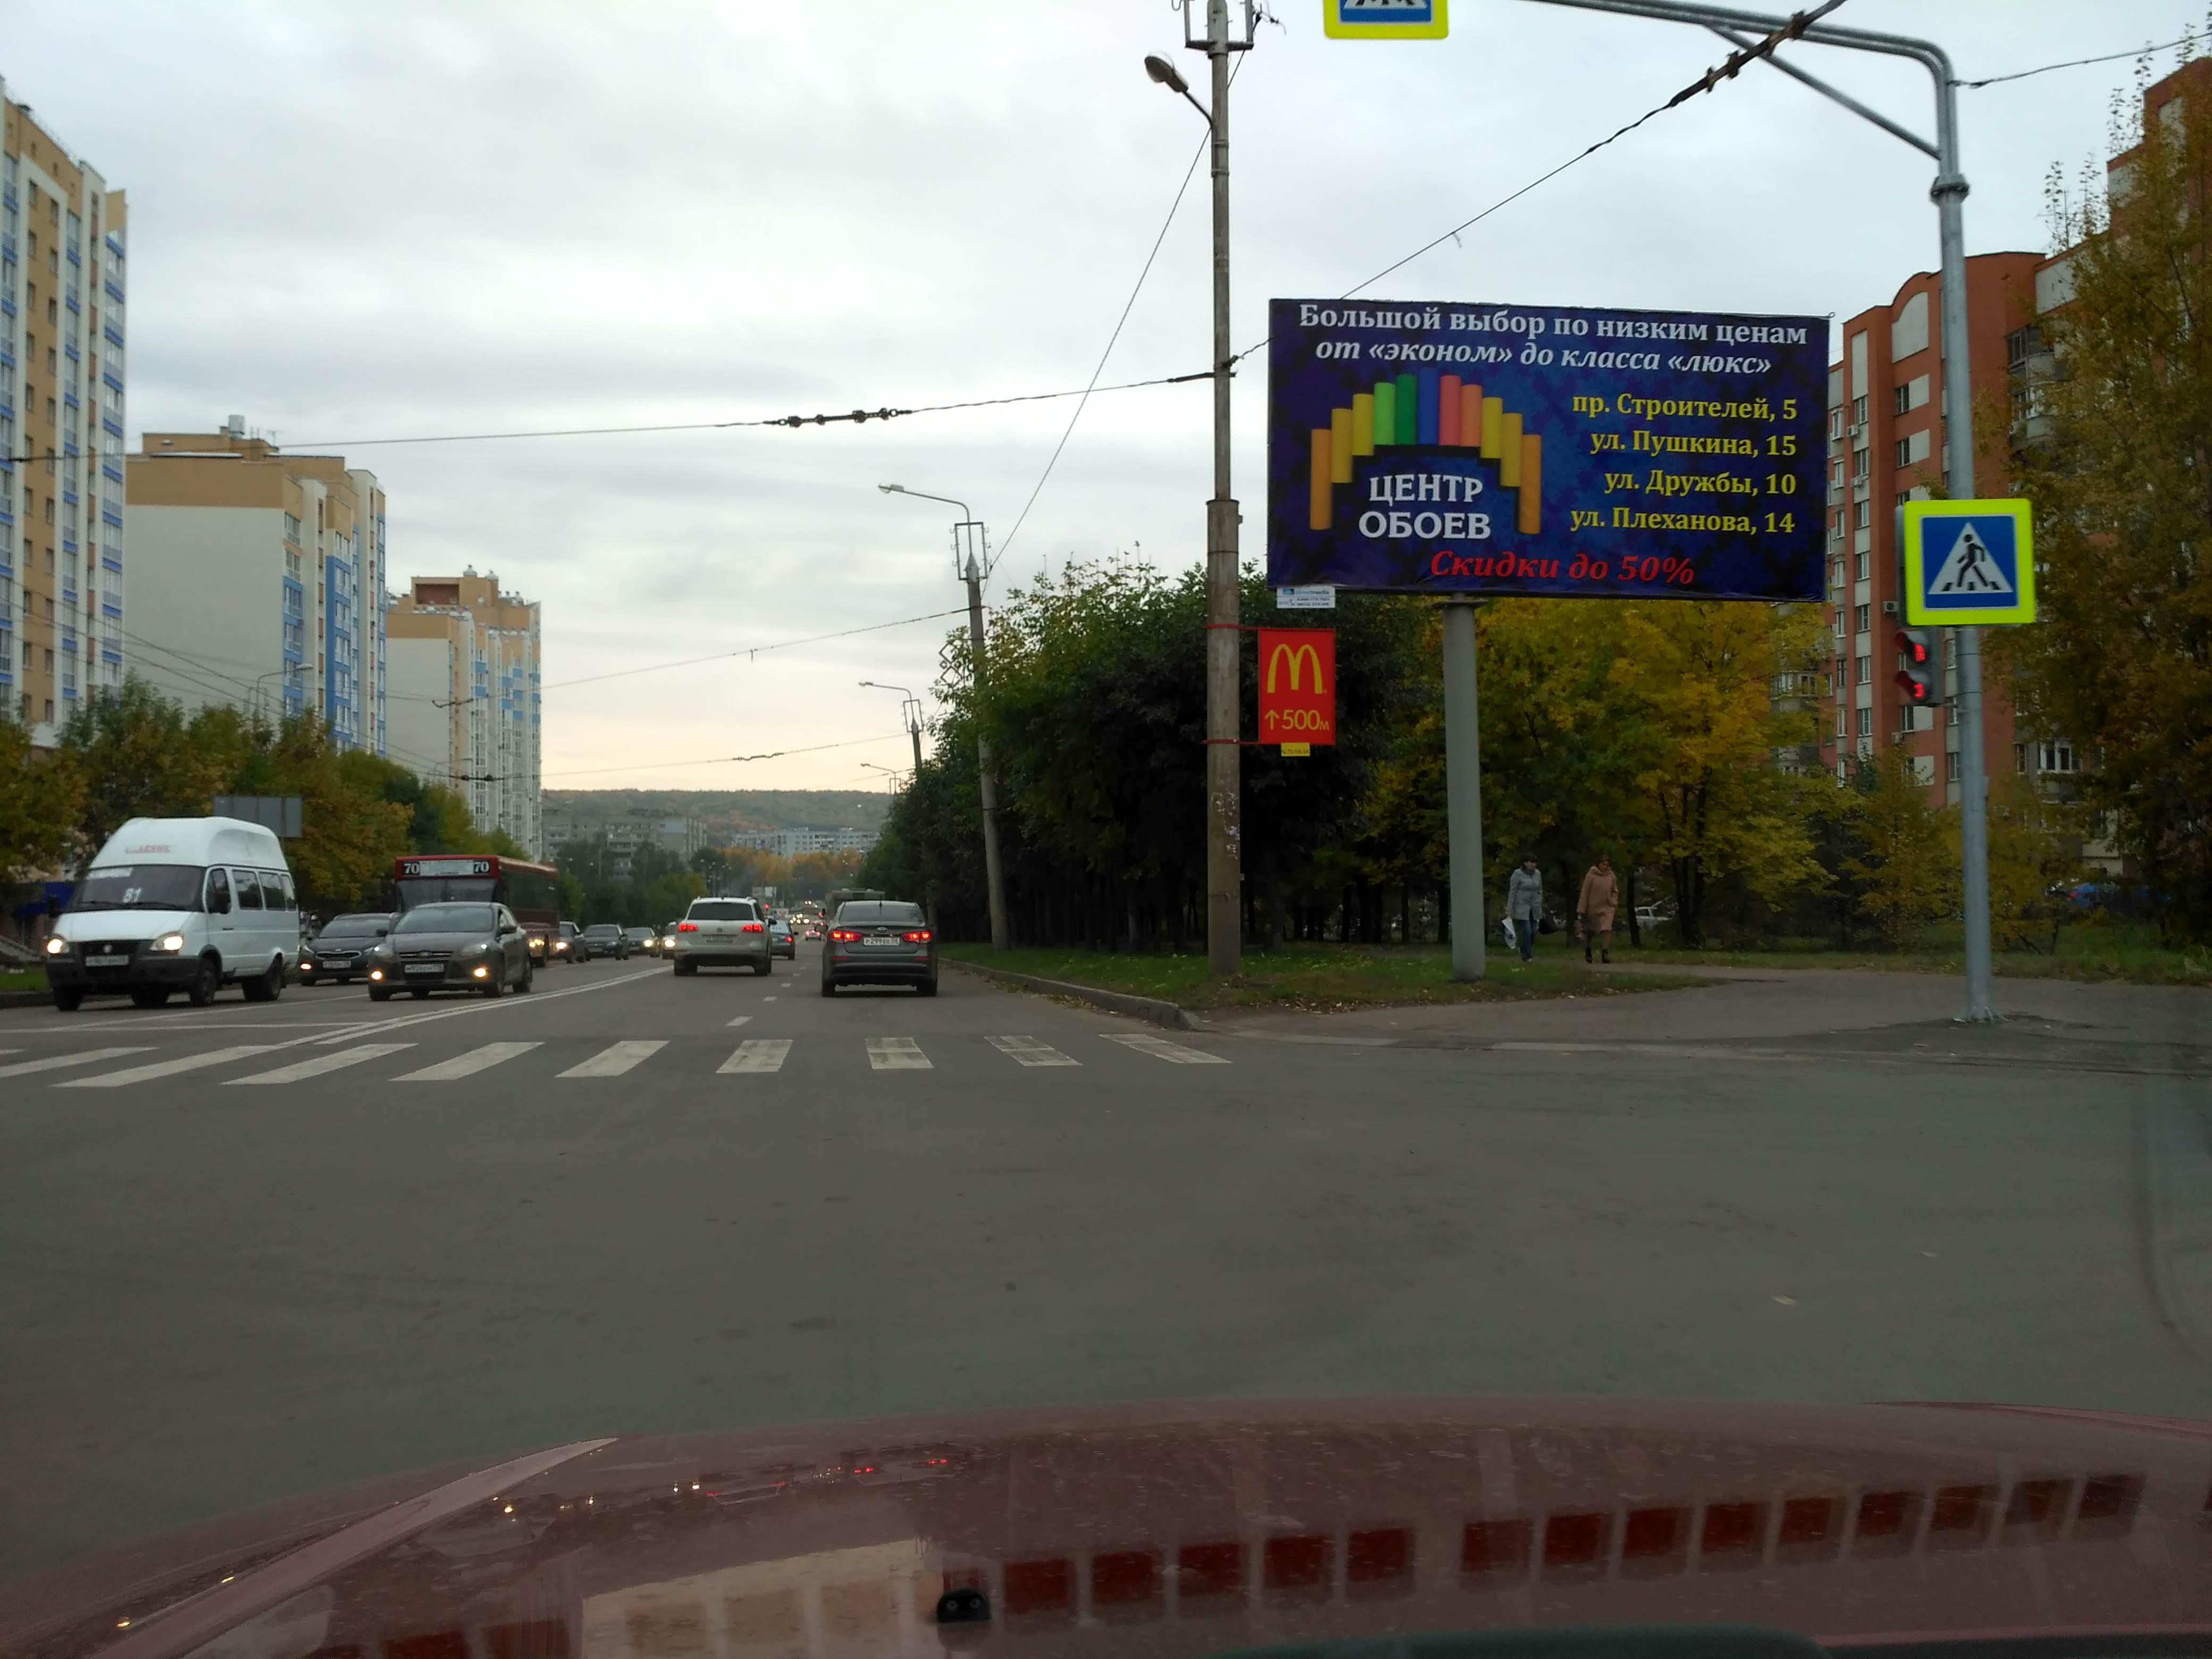 ул. Тернопольская, 7